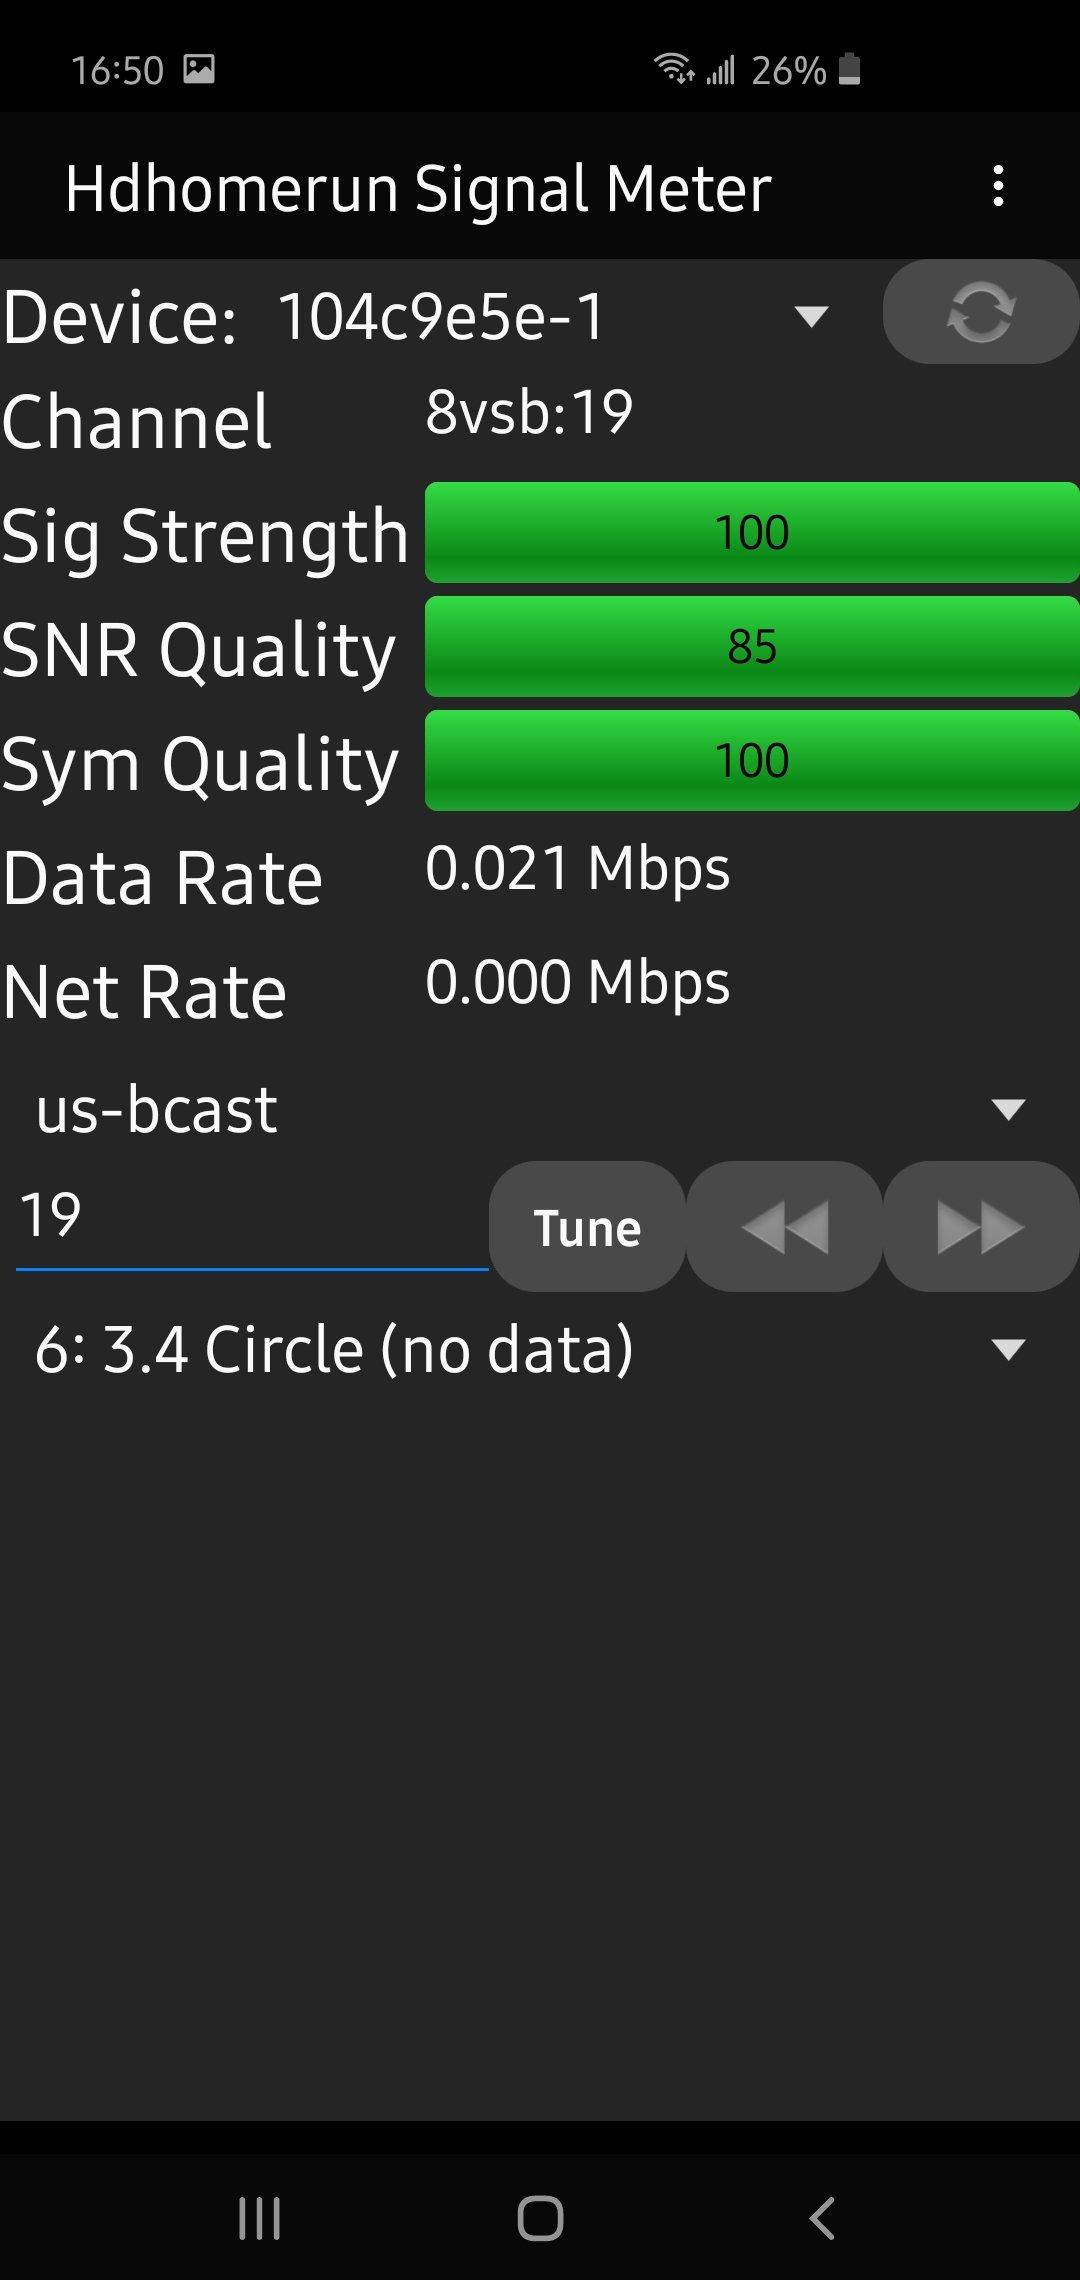 Click image for larger version  Name:Screenshot_20200213-165045_Hdhomerun Signal Meter_1581634279138.jpg Views:37 Size:264.9 KB ID:2684602